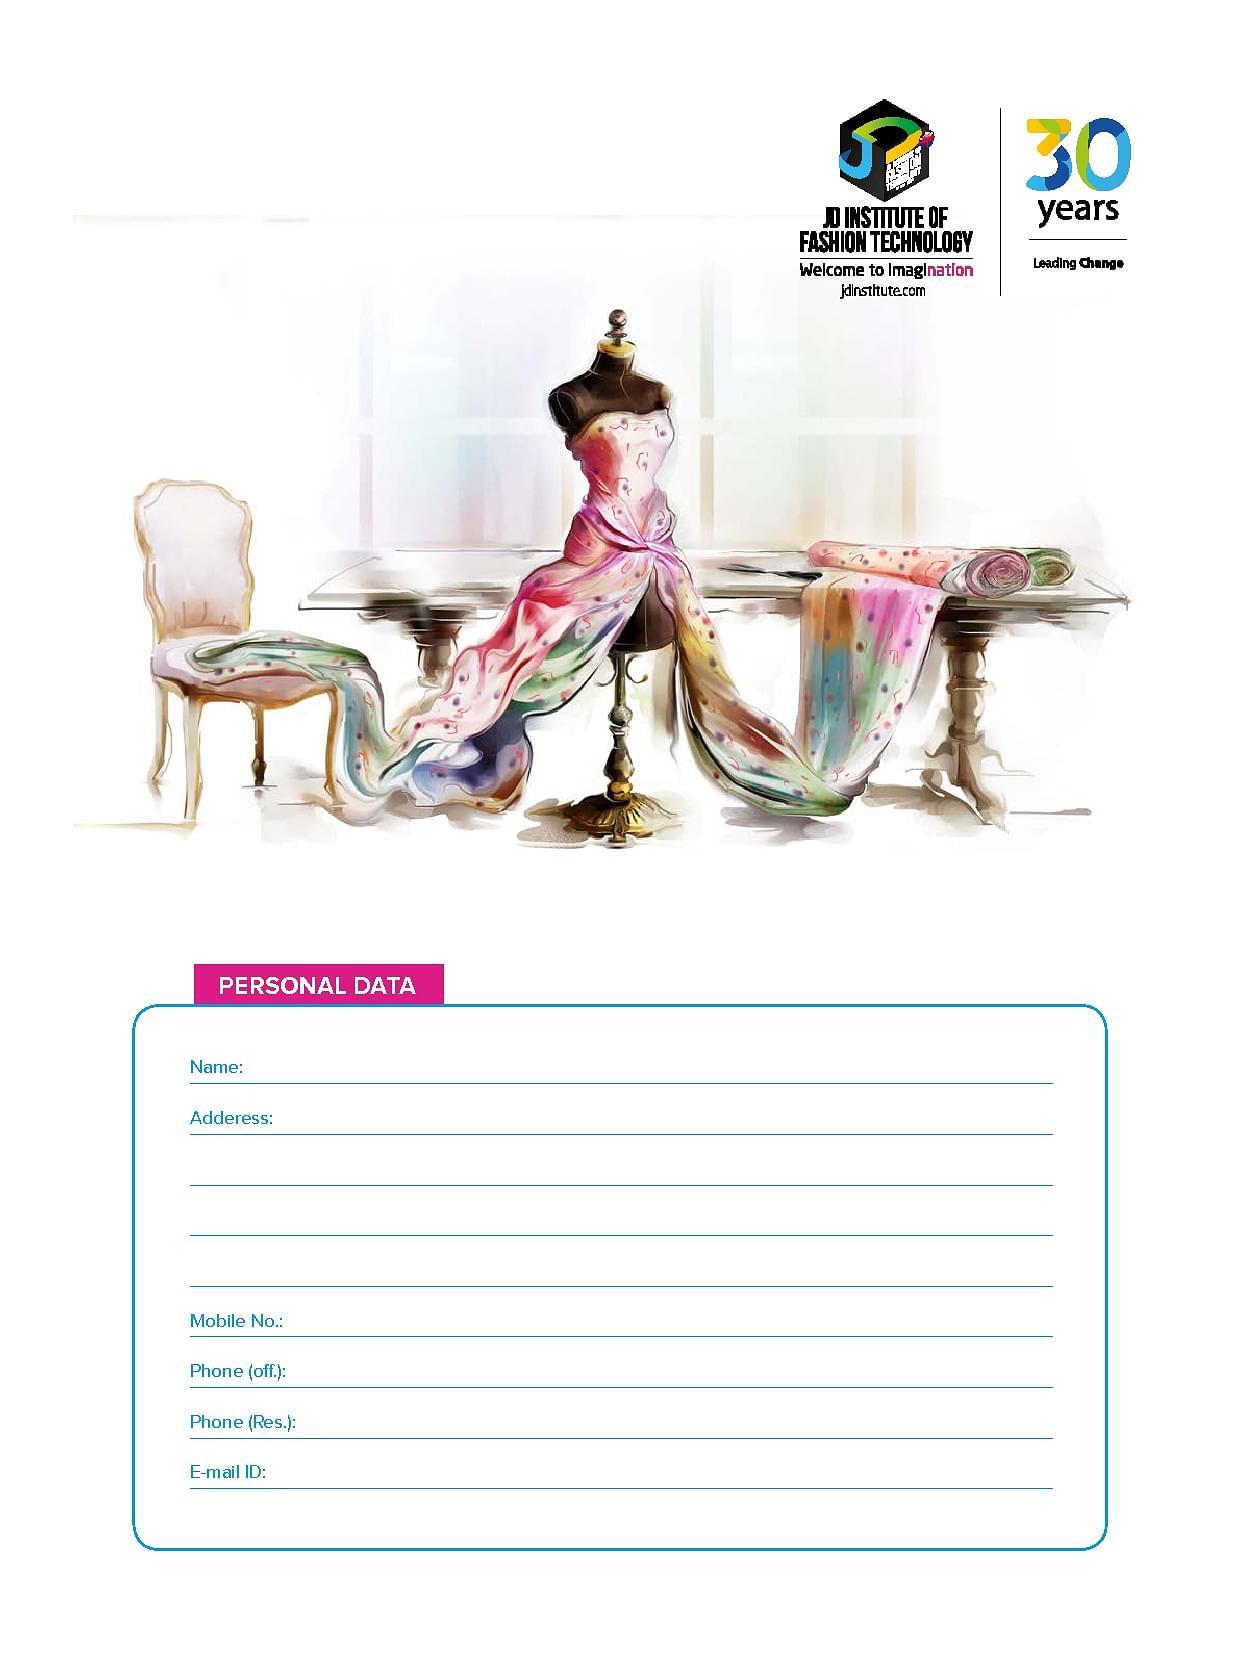 Jd.com ipo prospectus pdf